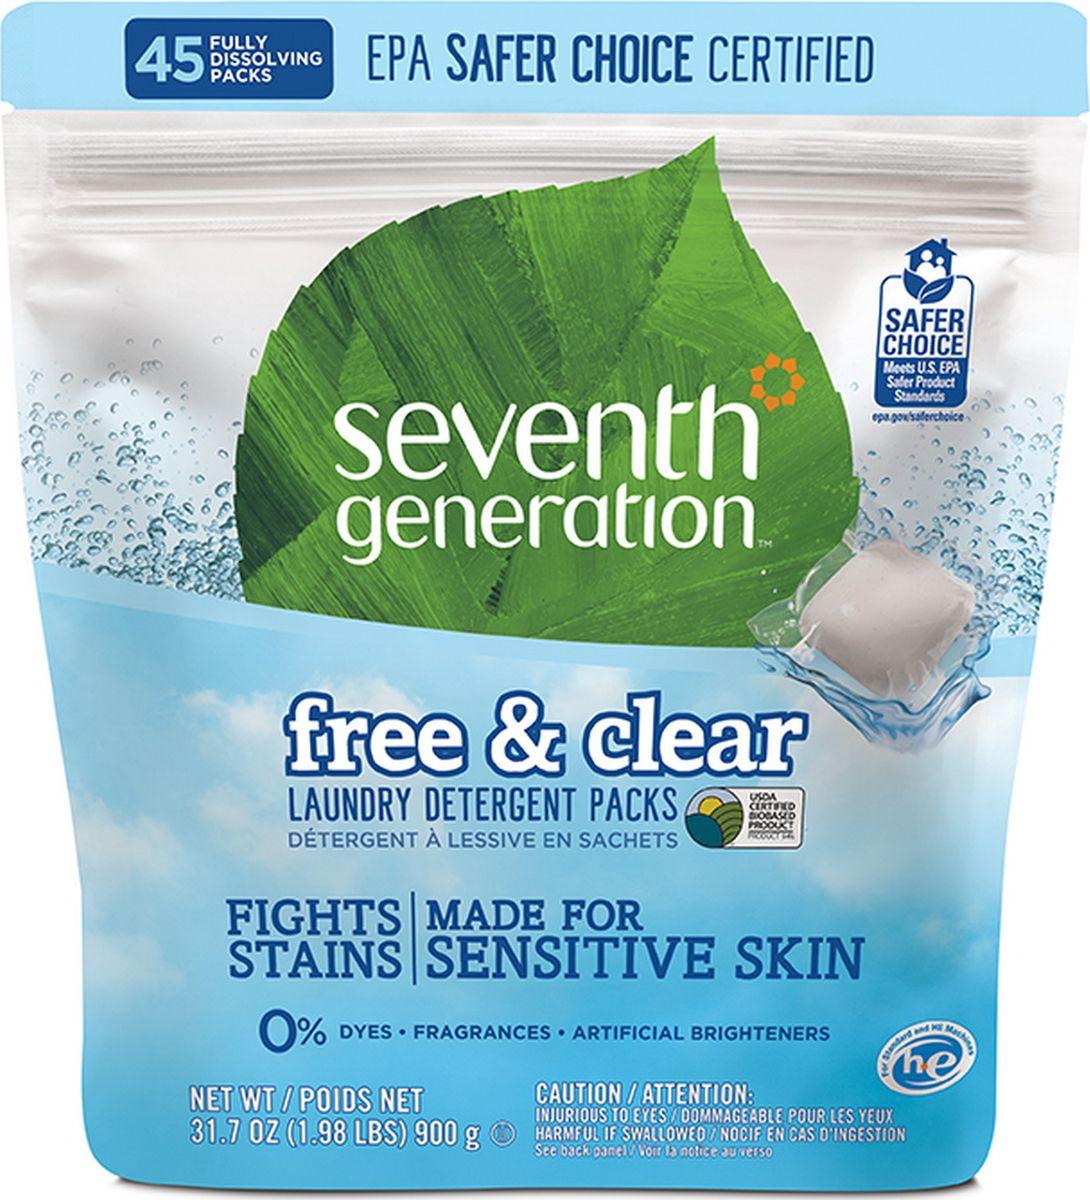 Капсулы для стирки Seventh Generation, без запаха, 45 шт кондиционер для белья seventh generation без запаха 946 мл